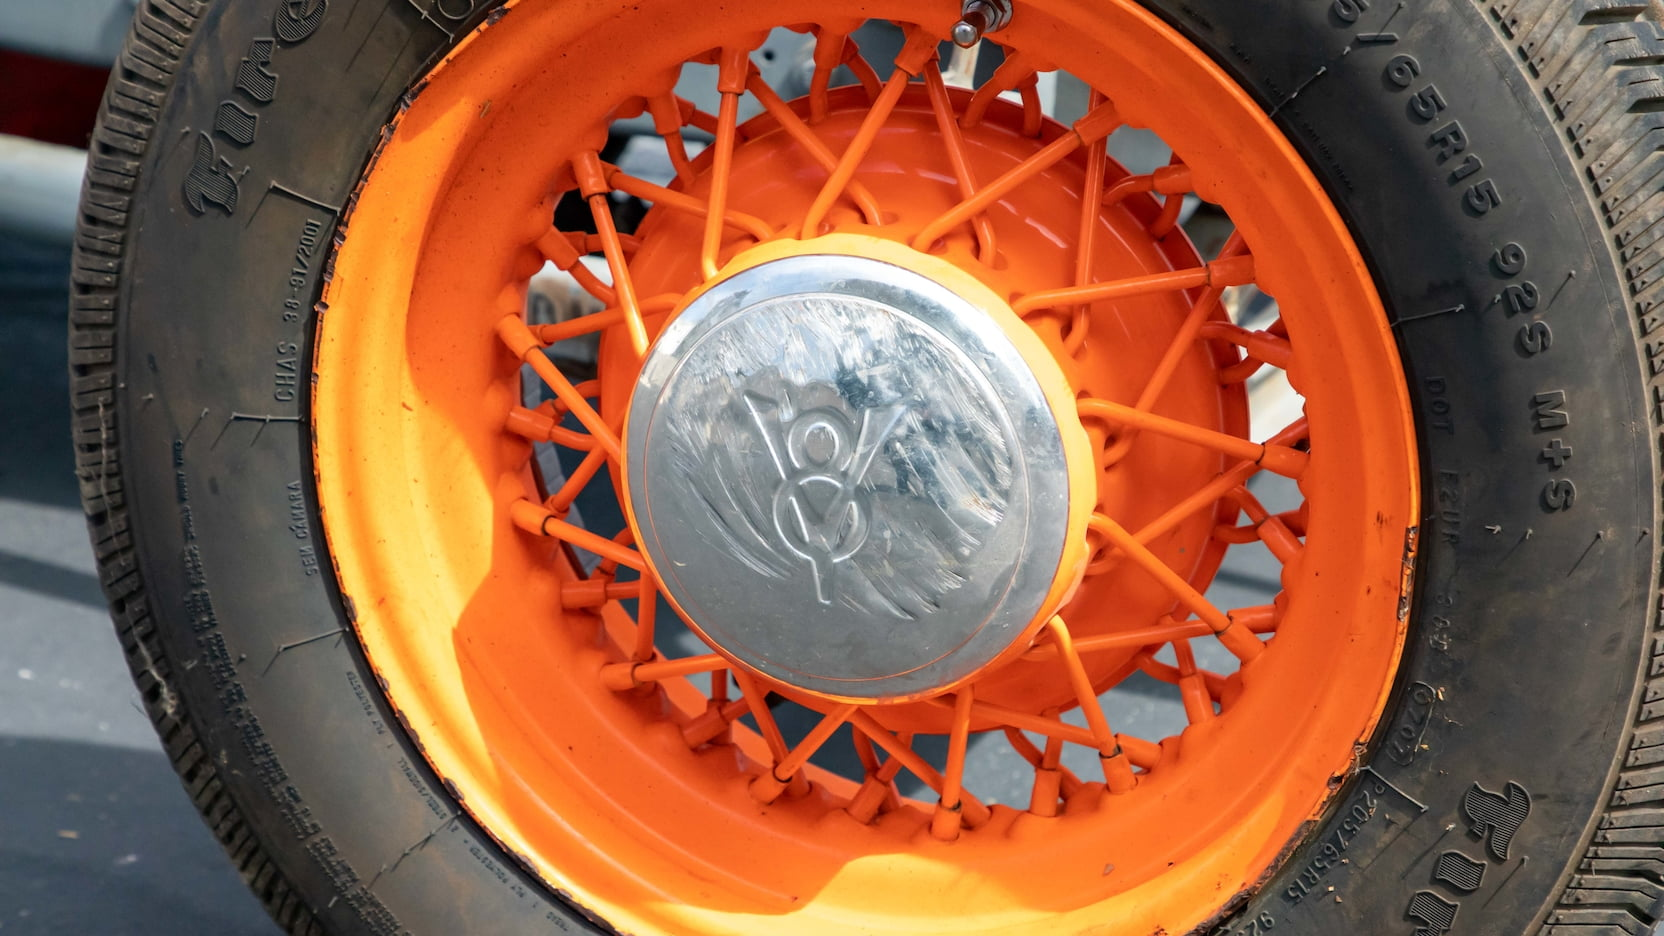 1927 Ford T-bucket track roadster Parnelli Jones Mecum wheel